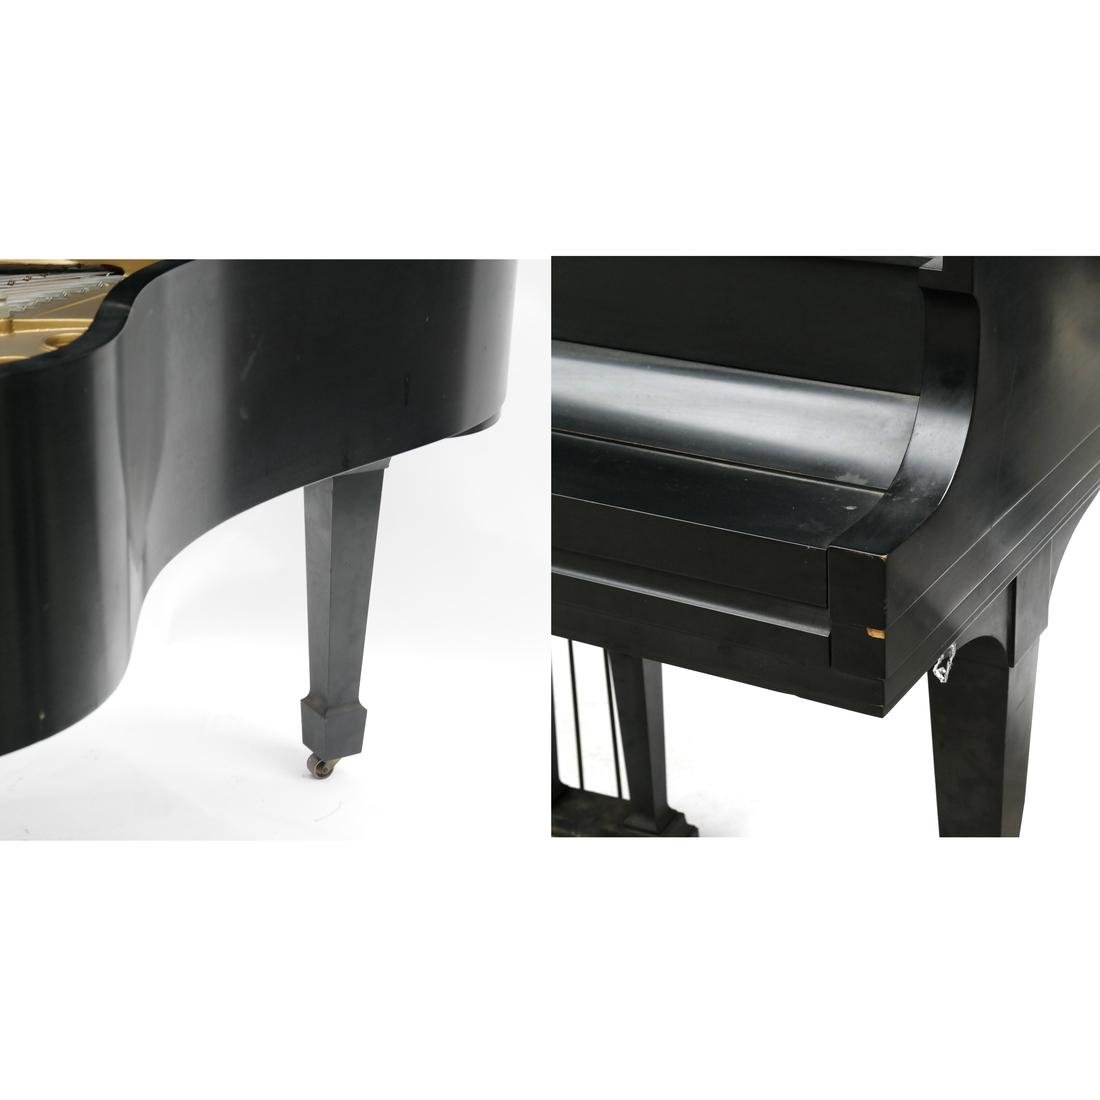 Steinway & Sons Studio Grand Piano, Model 404061 M - 5